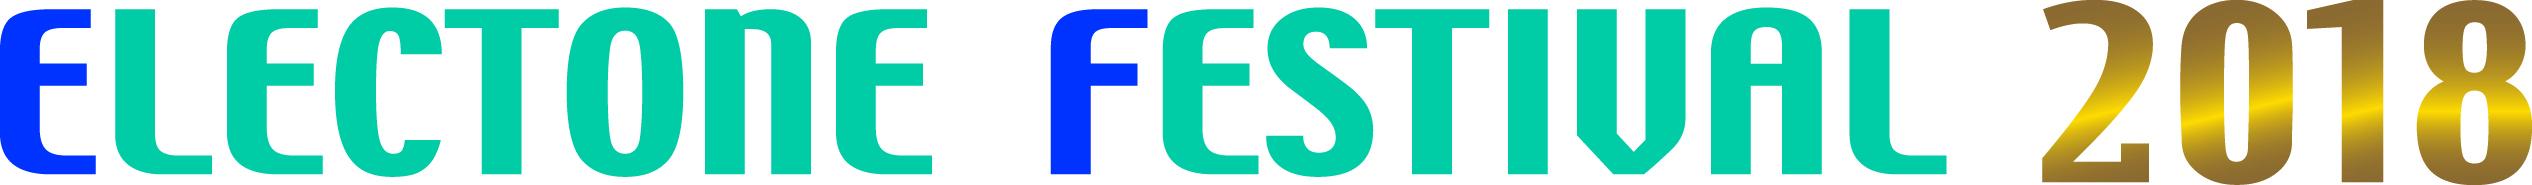 ELECTONE FESTIVAL2018ロゴ-1行.jpg